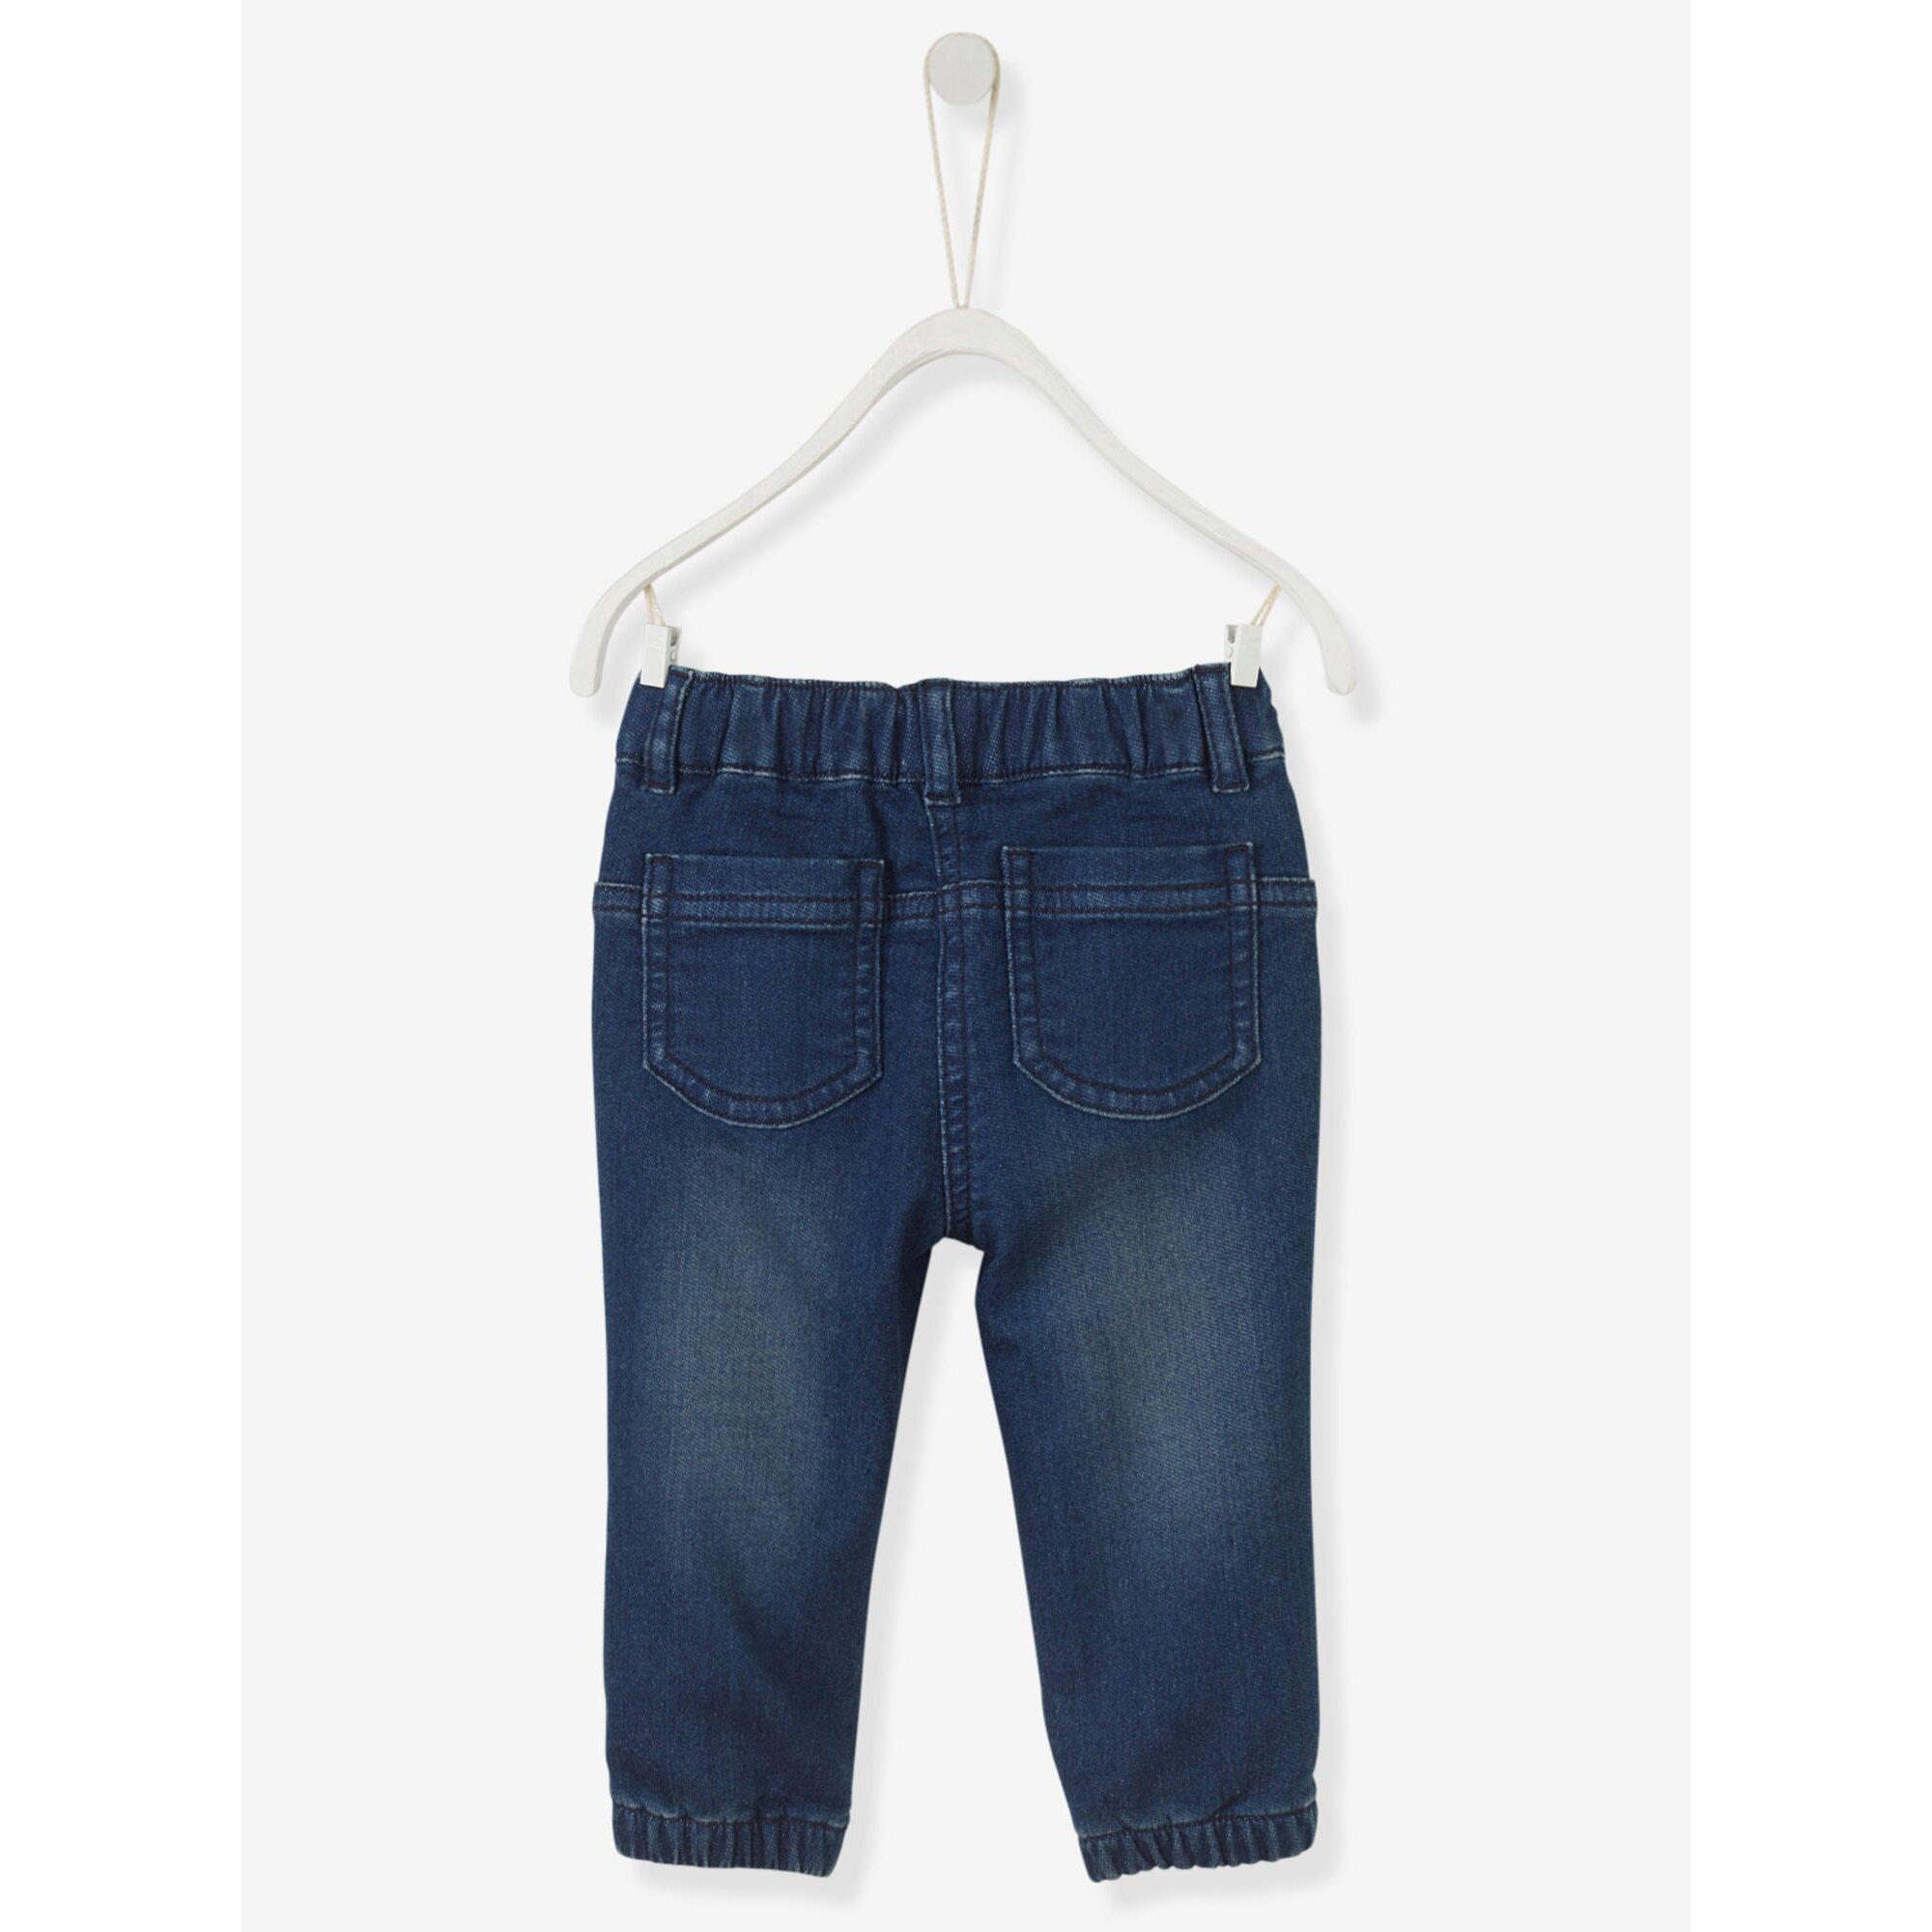 vertbaudet-sweathose-in-jeansoptik-baby-jungen, 18.99 EUR @ babywalz-de